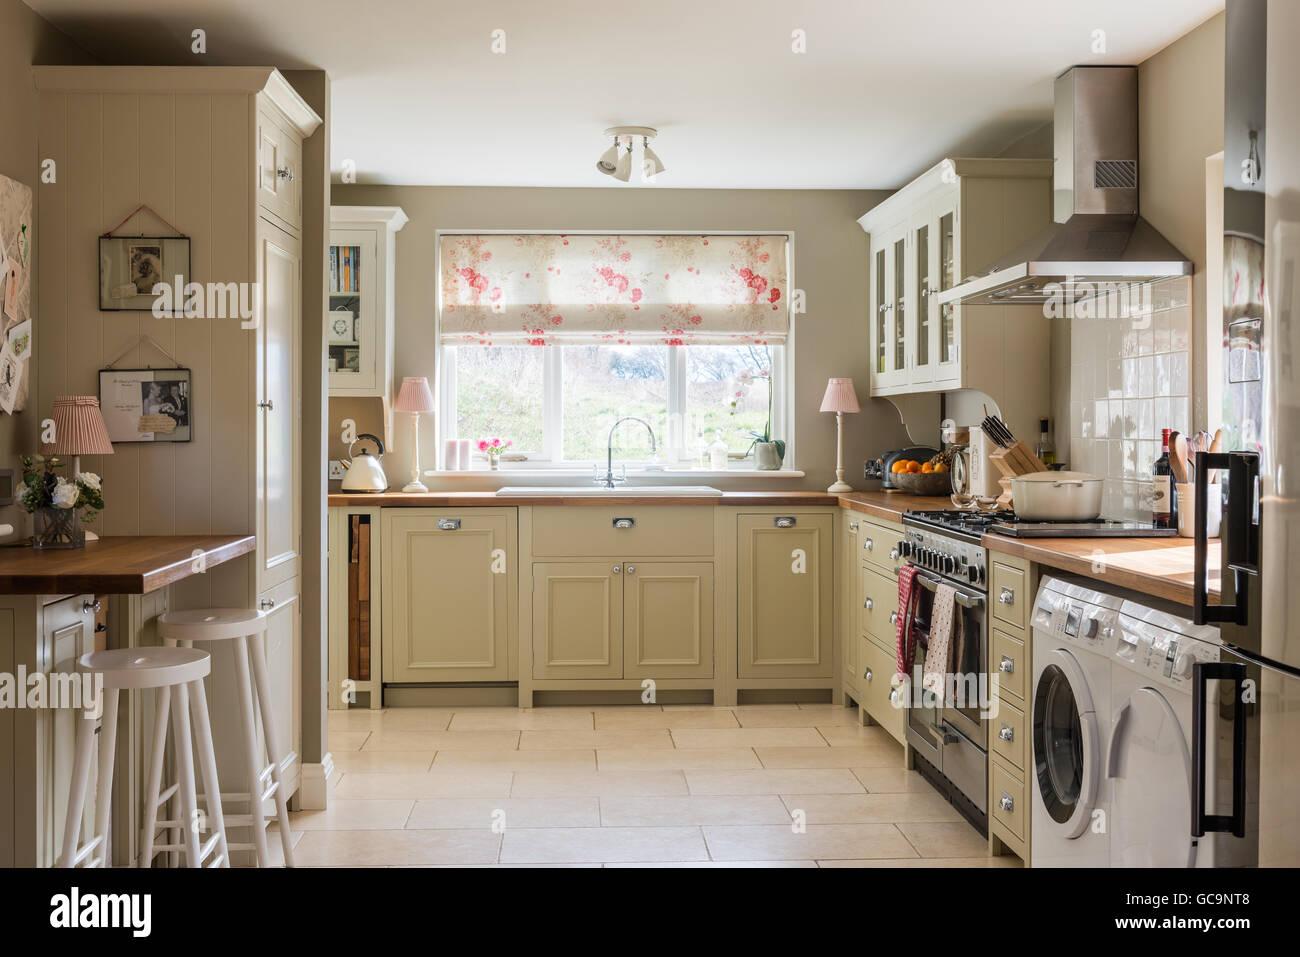 Tende Cucina Country Online | Arredamento Casa Mare Ikea